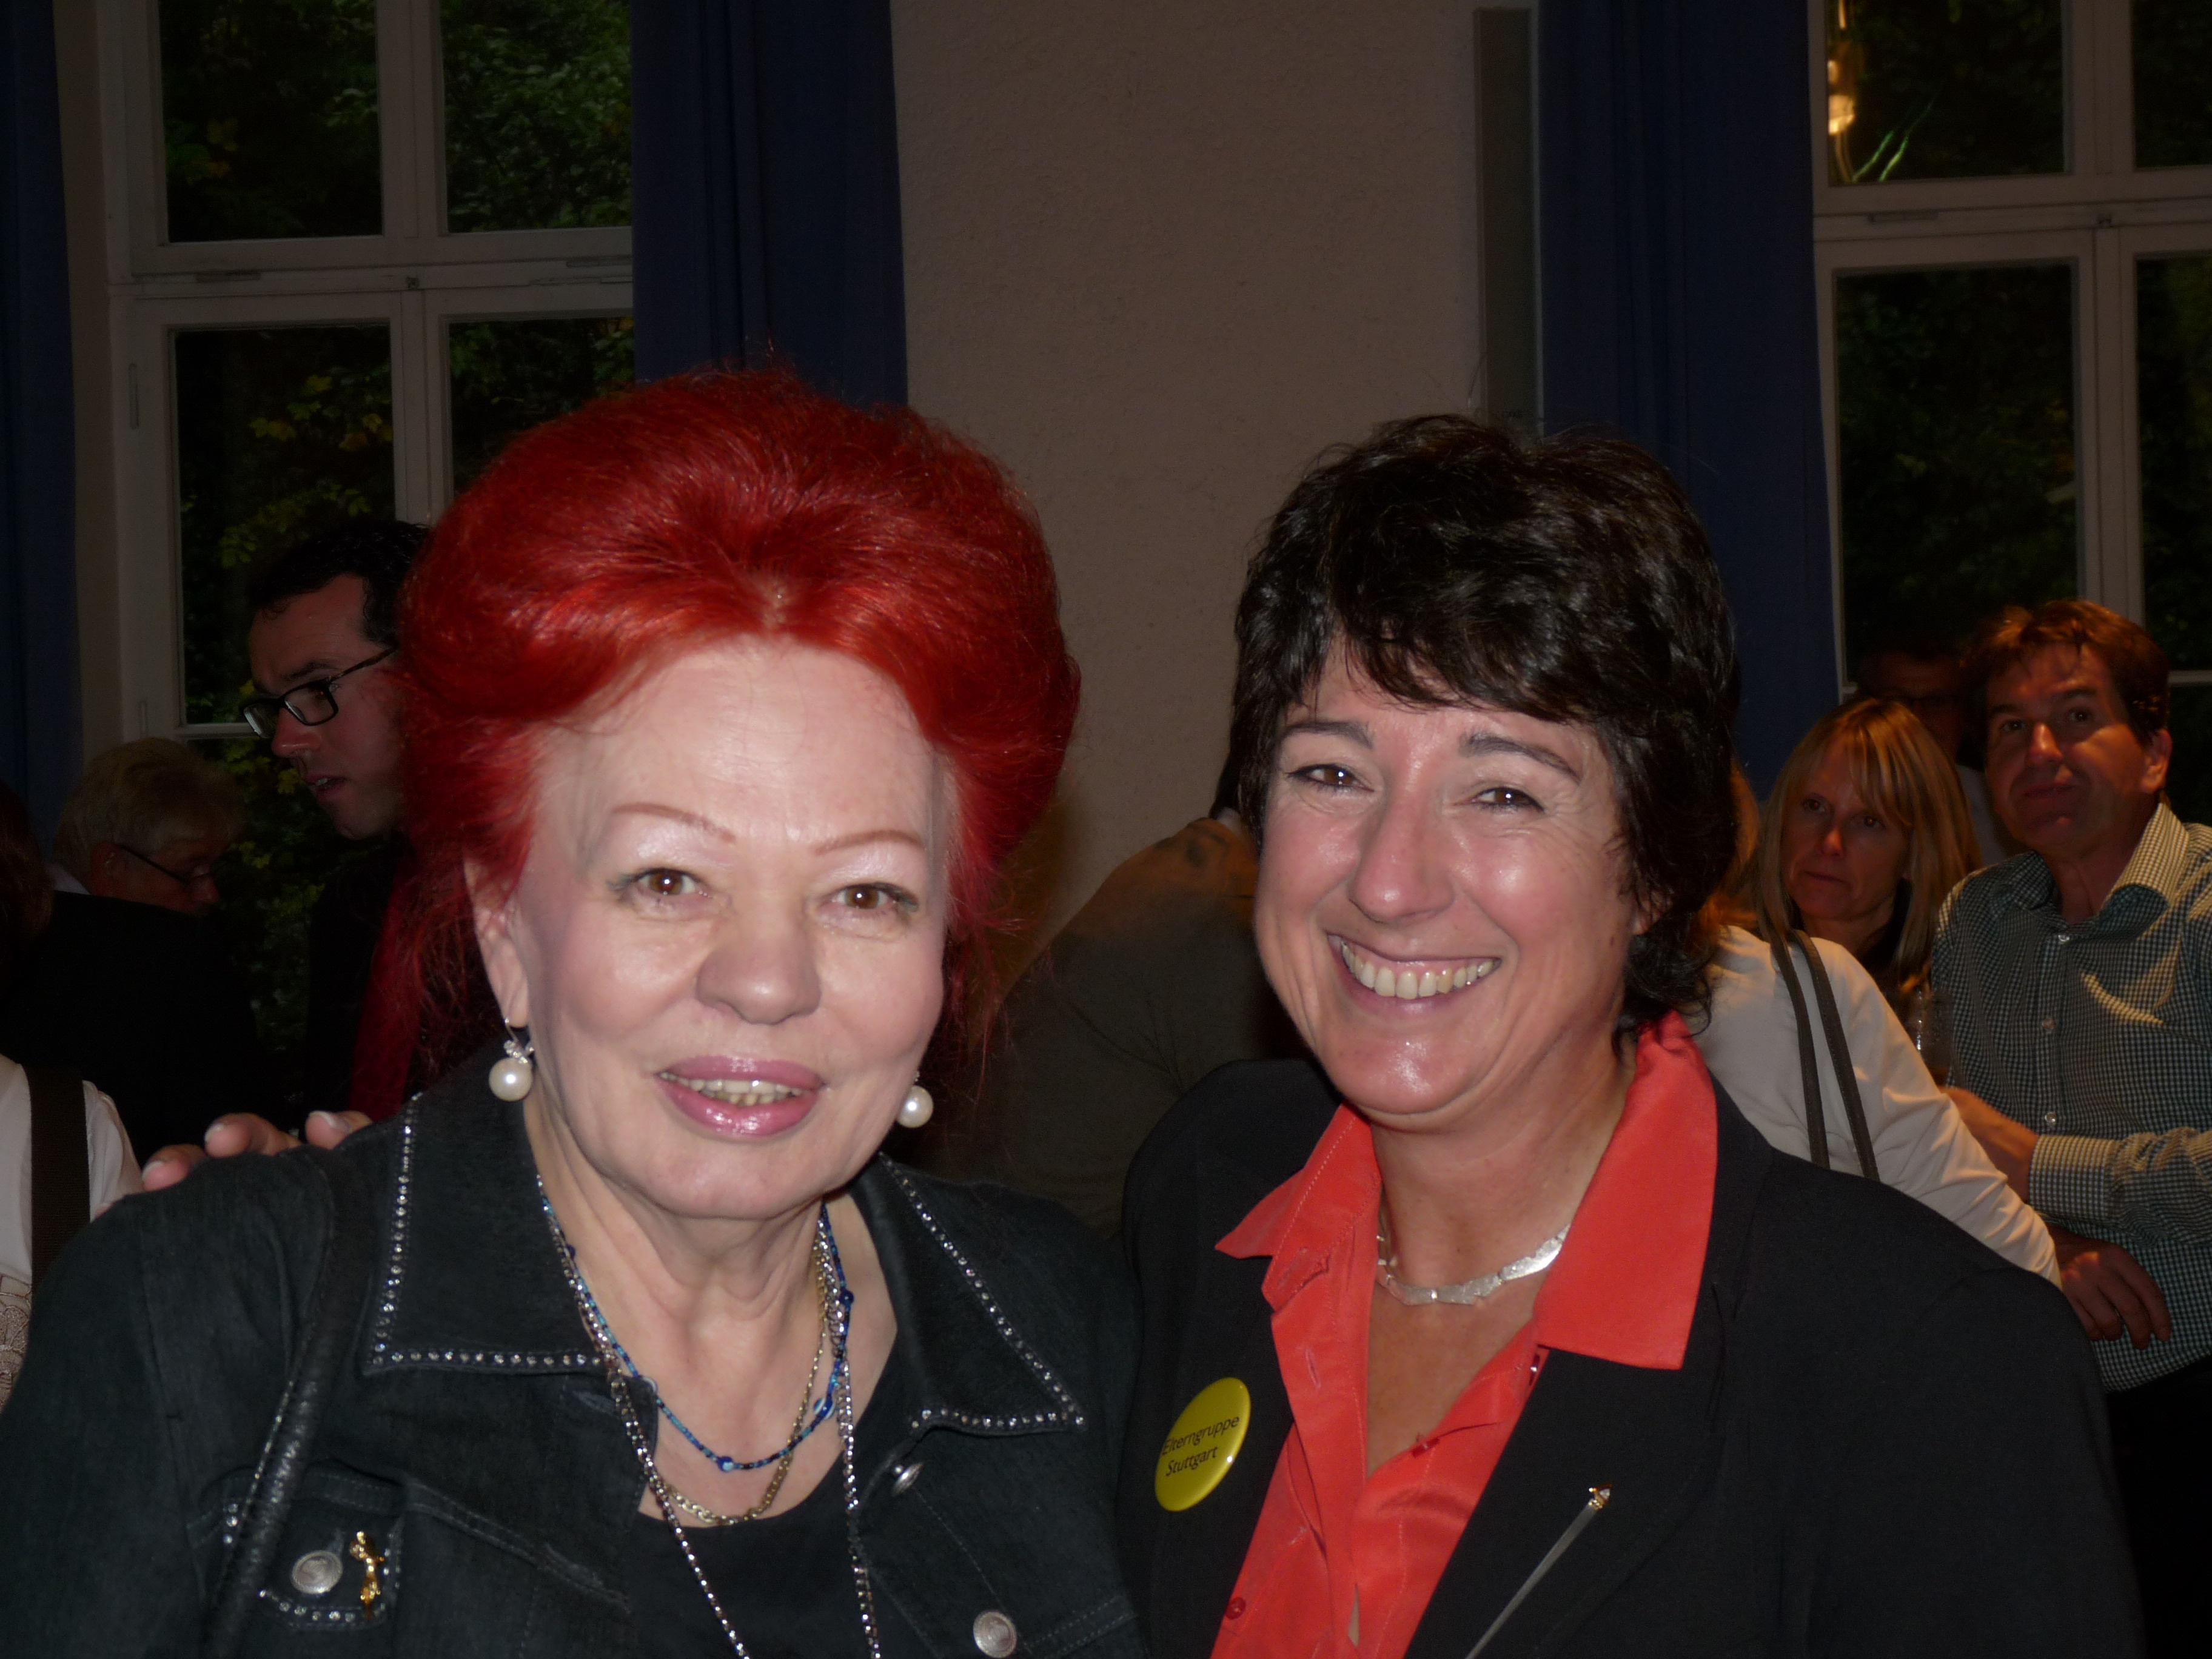 2013-Jubiläum-11-Laura Halding Hoppenheit Loni Bonifert